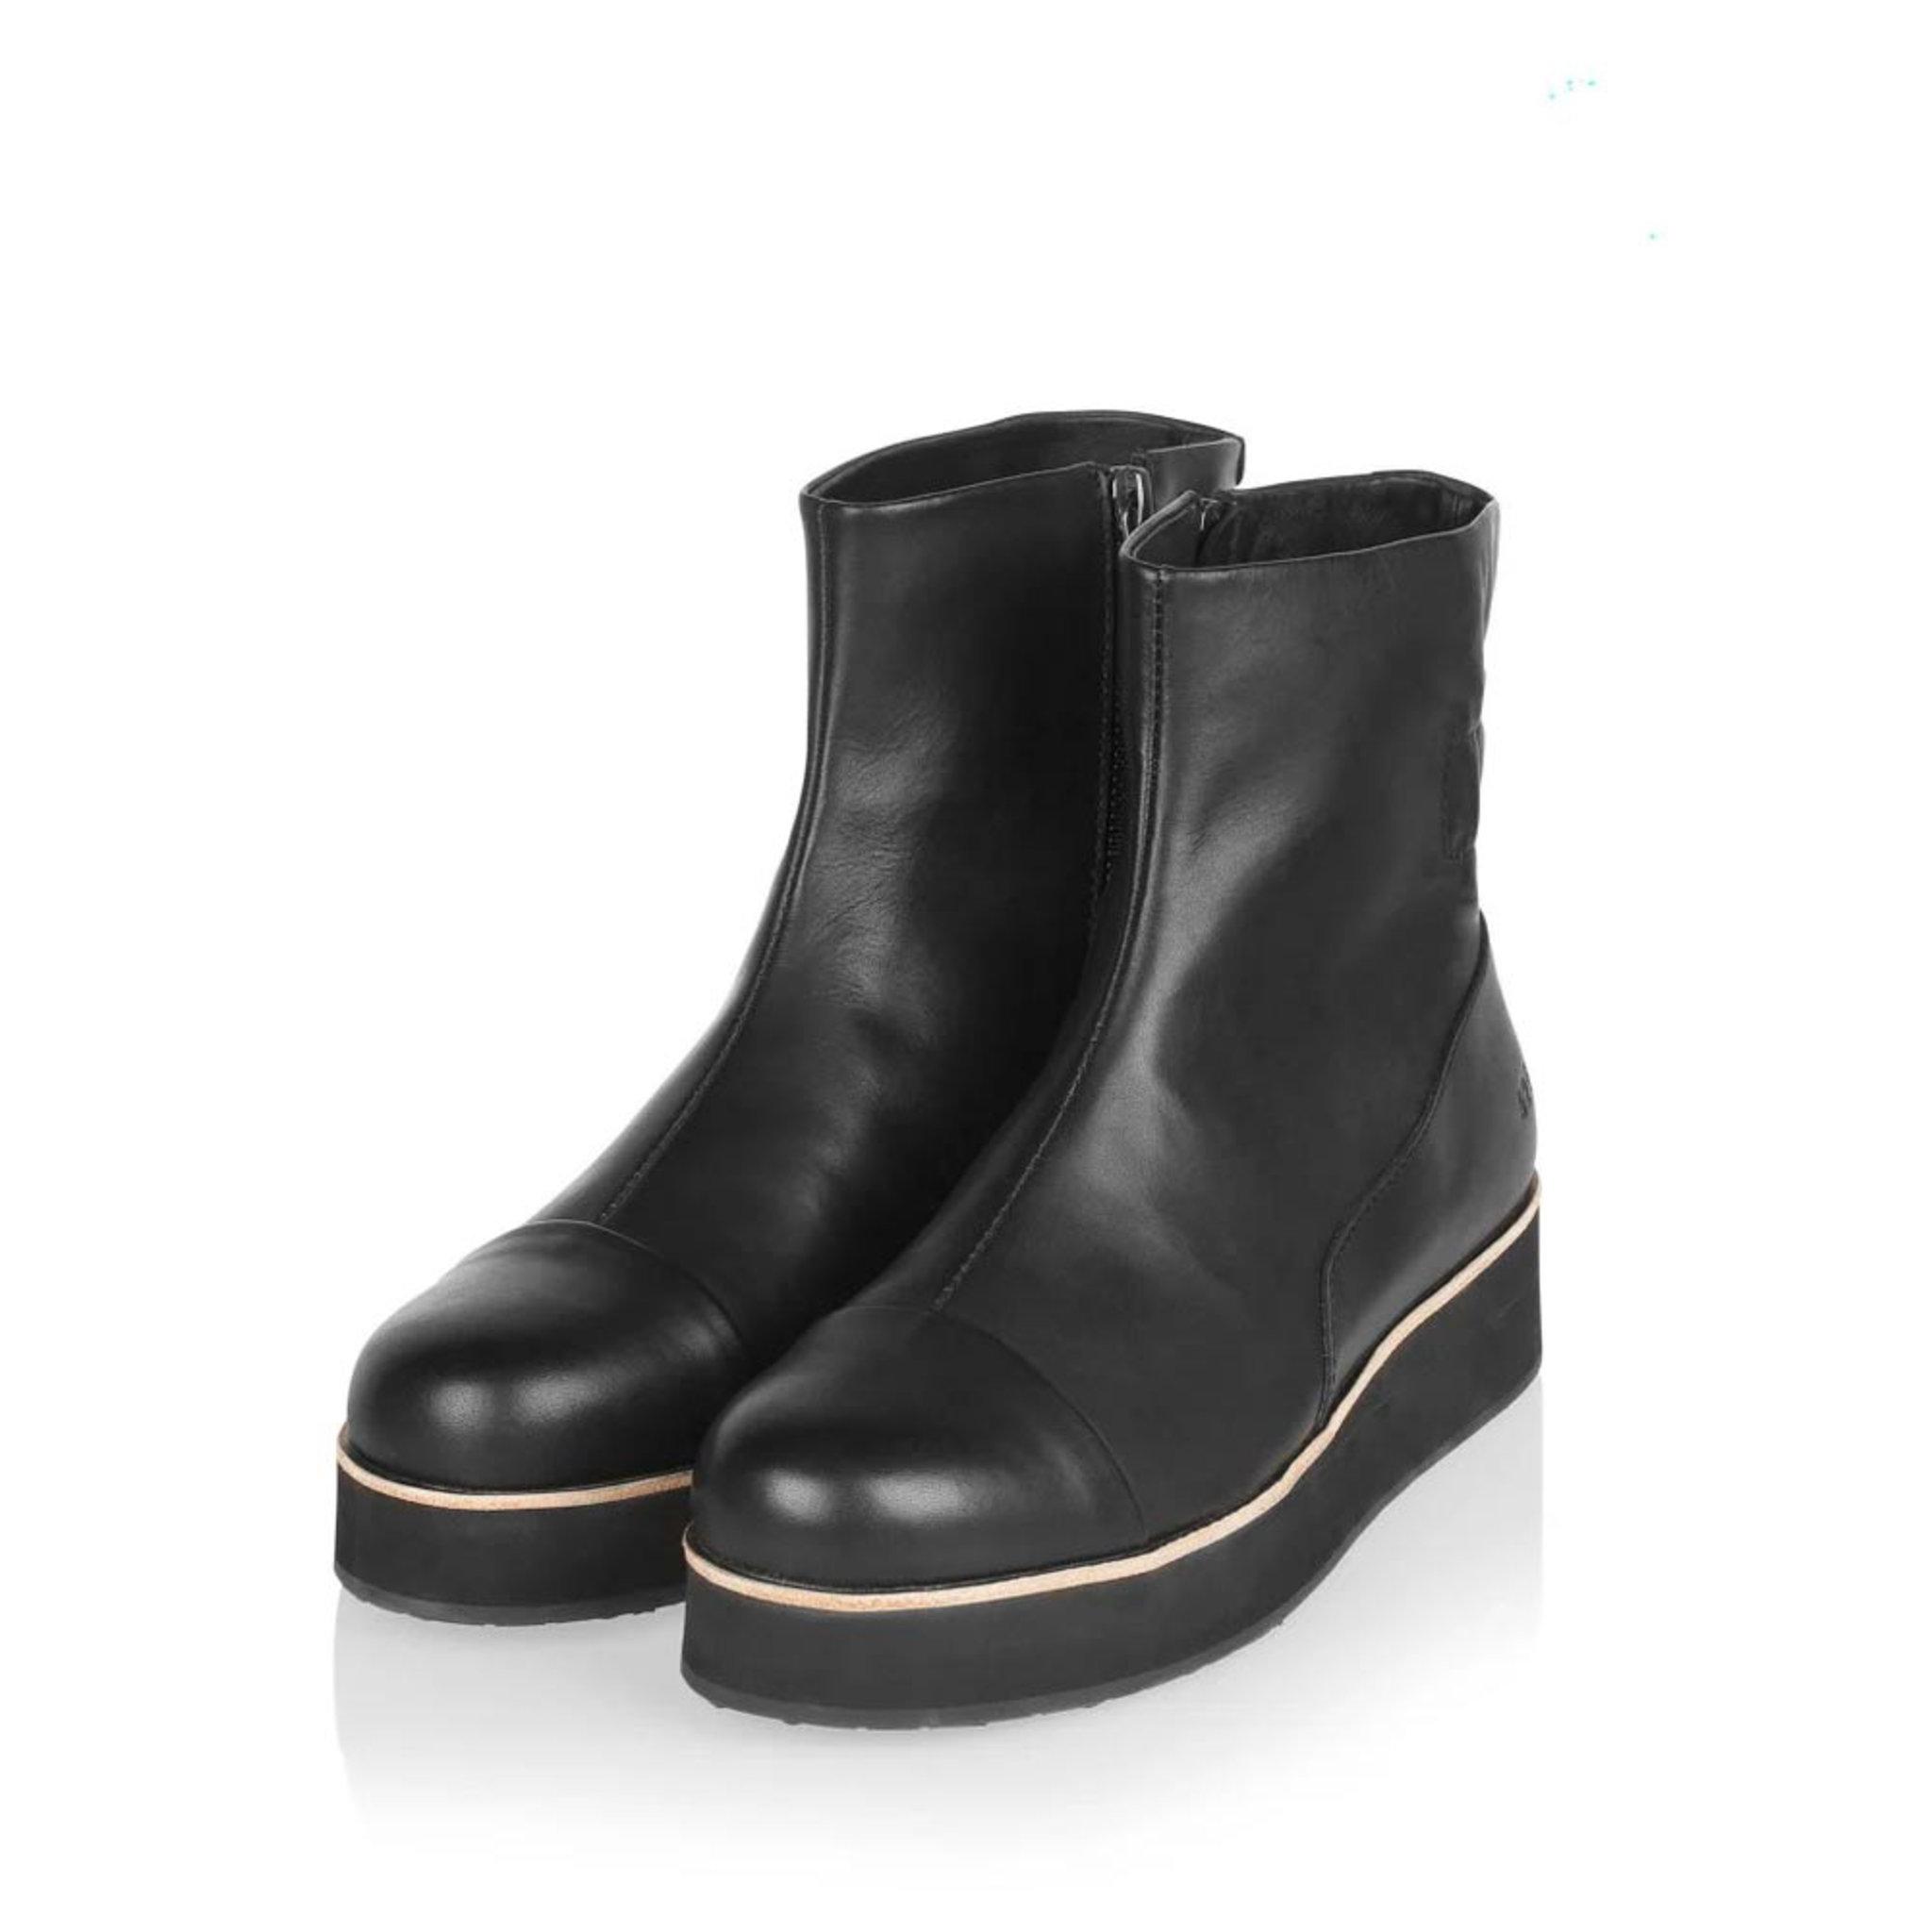 425g Elasto Leather